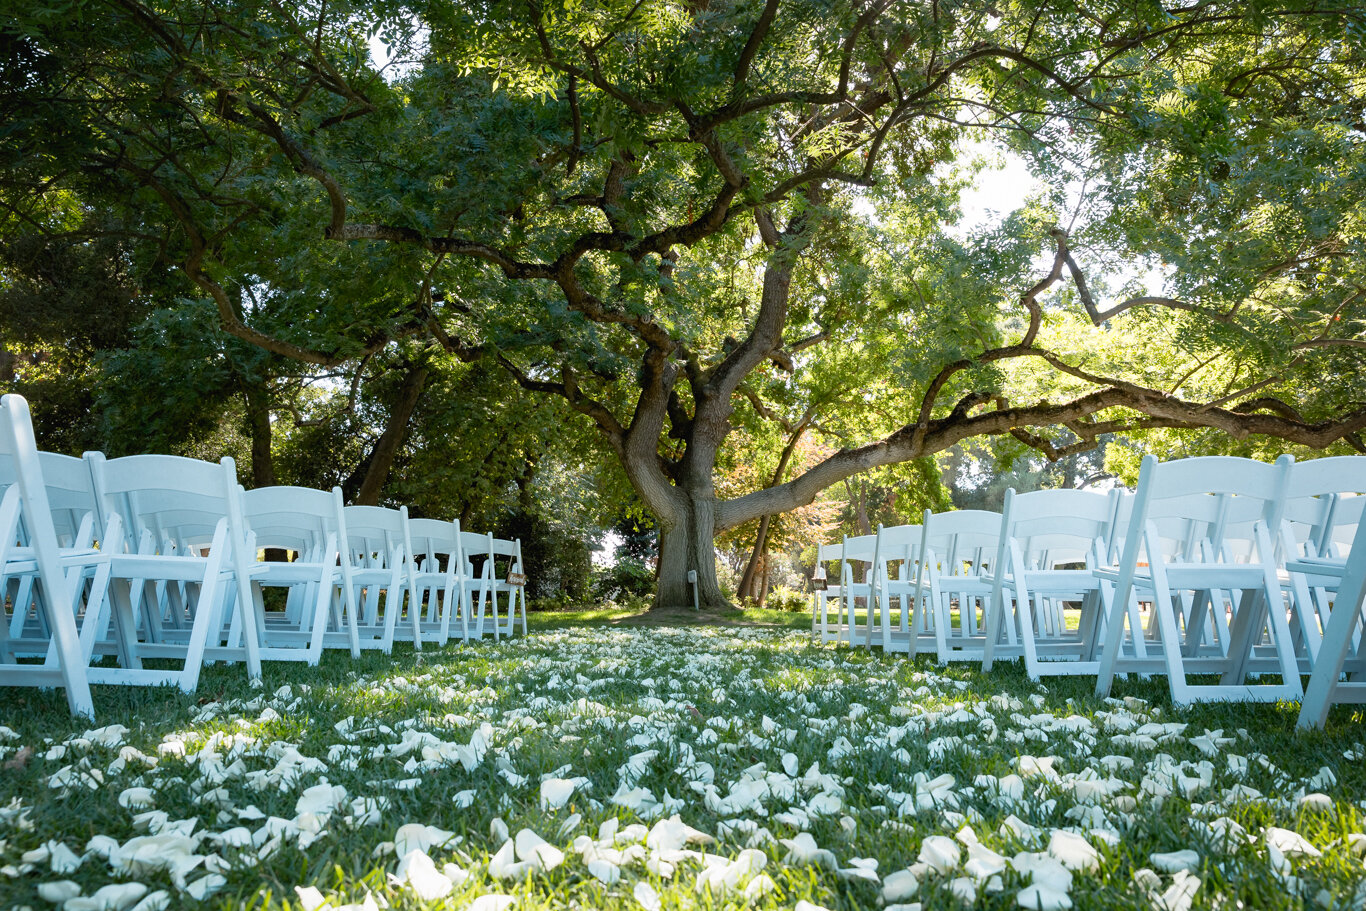 2019.08.24_Emily-Ashir-Wedding-at-the-Maples-5635.jpg